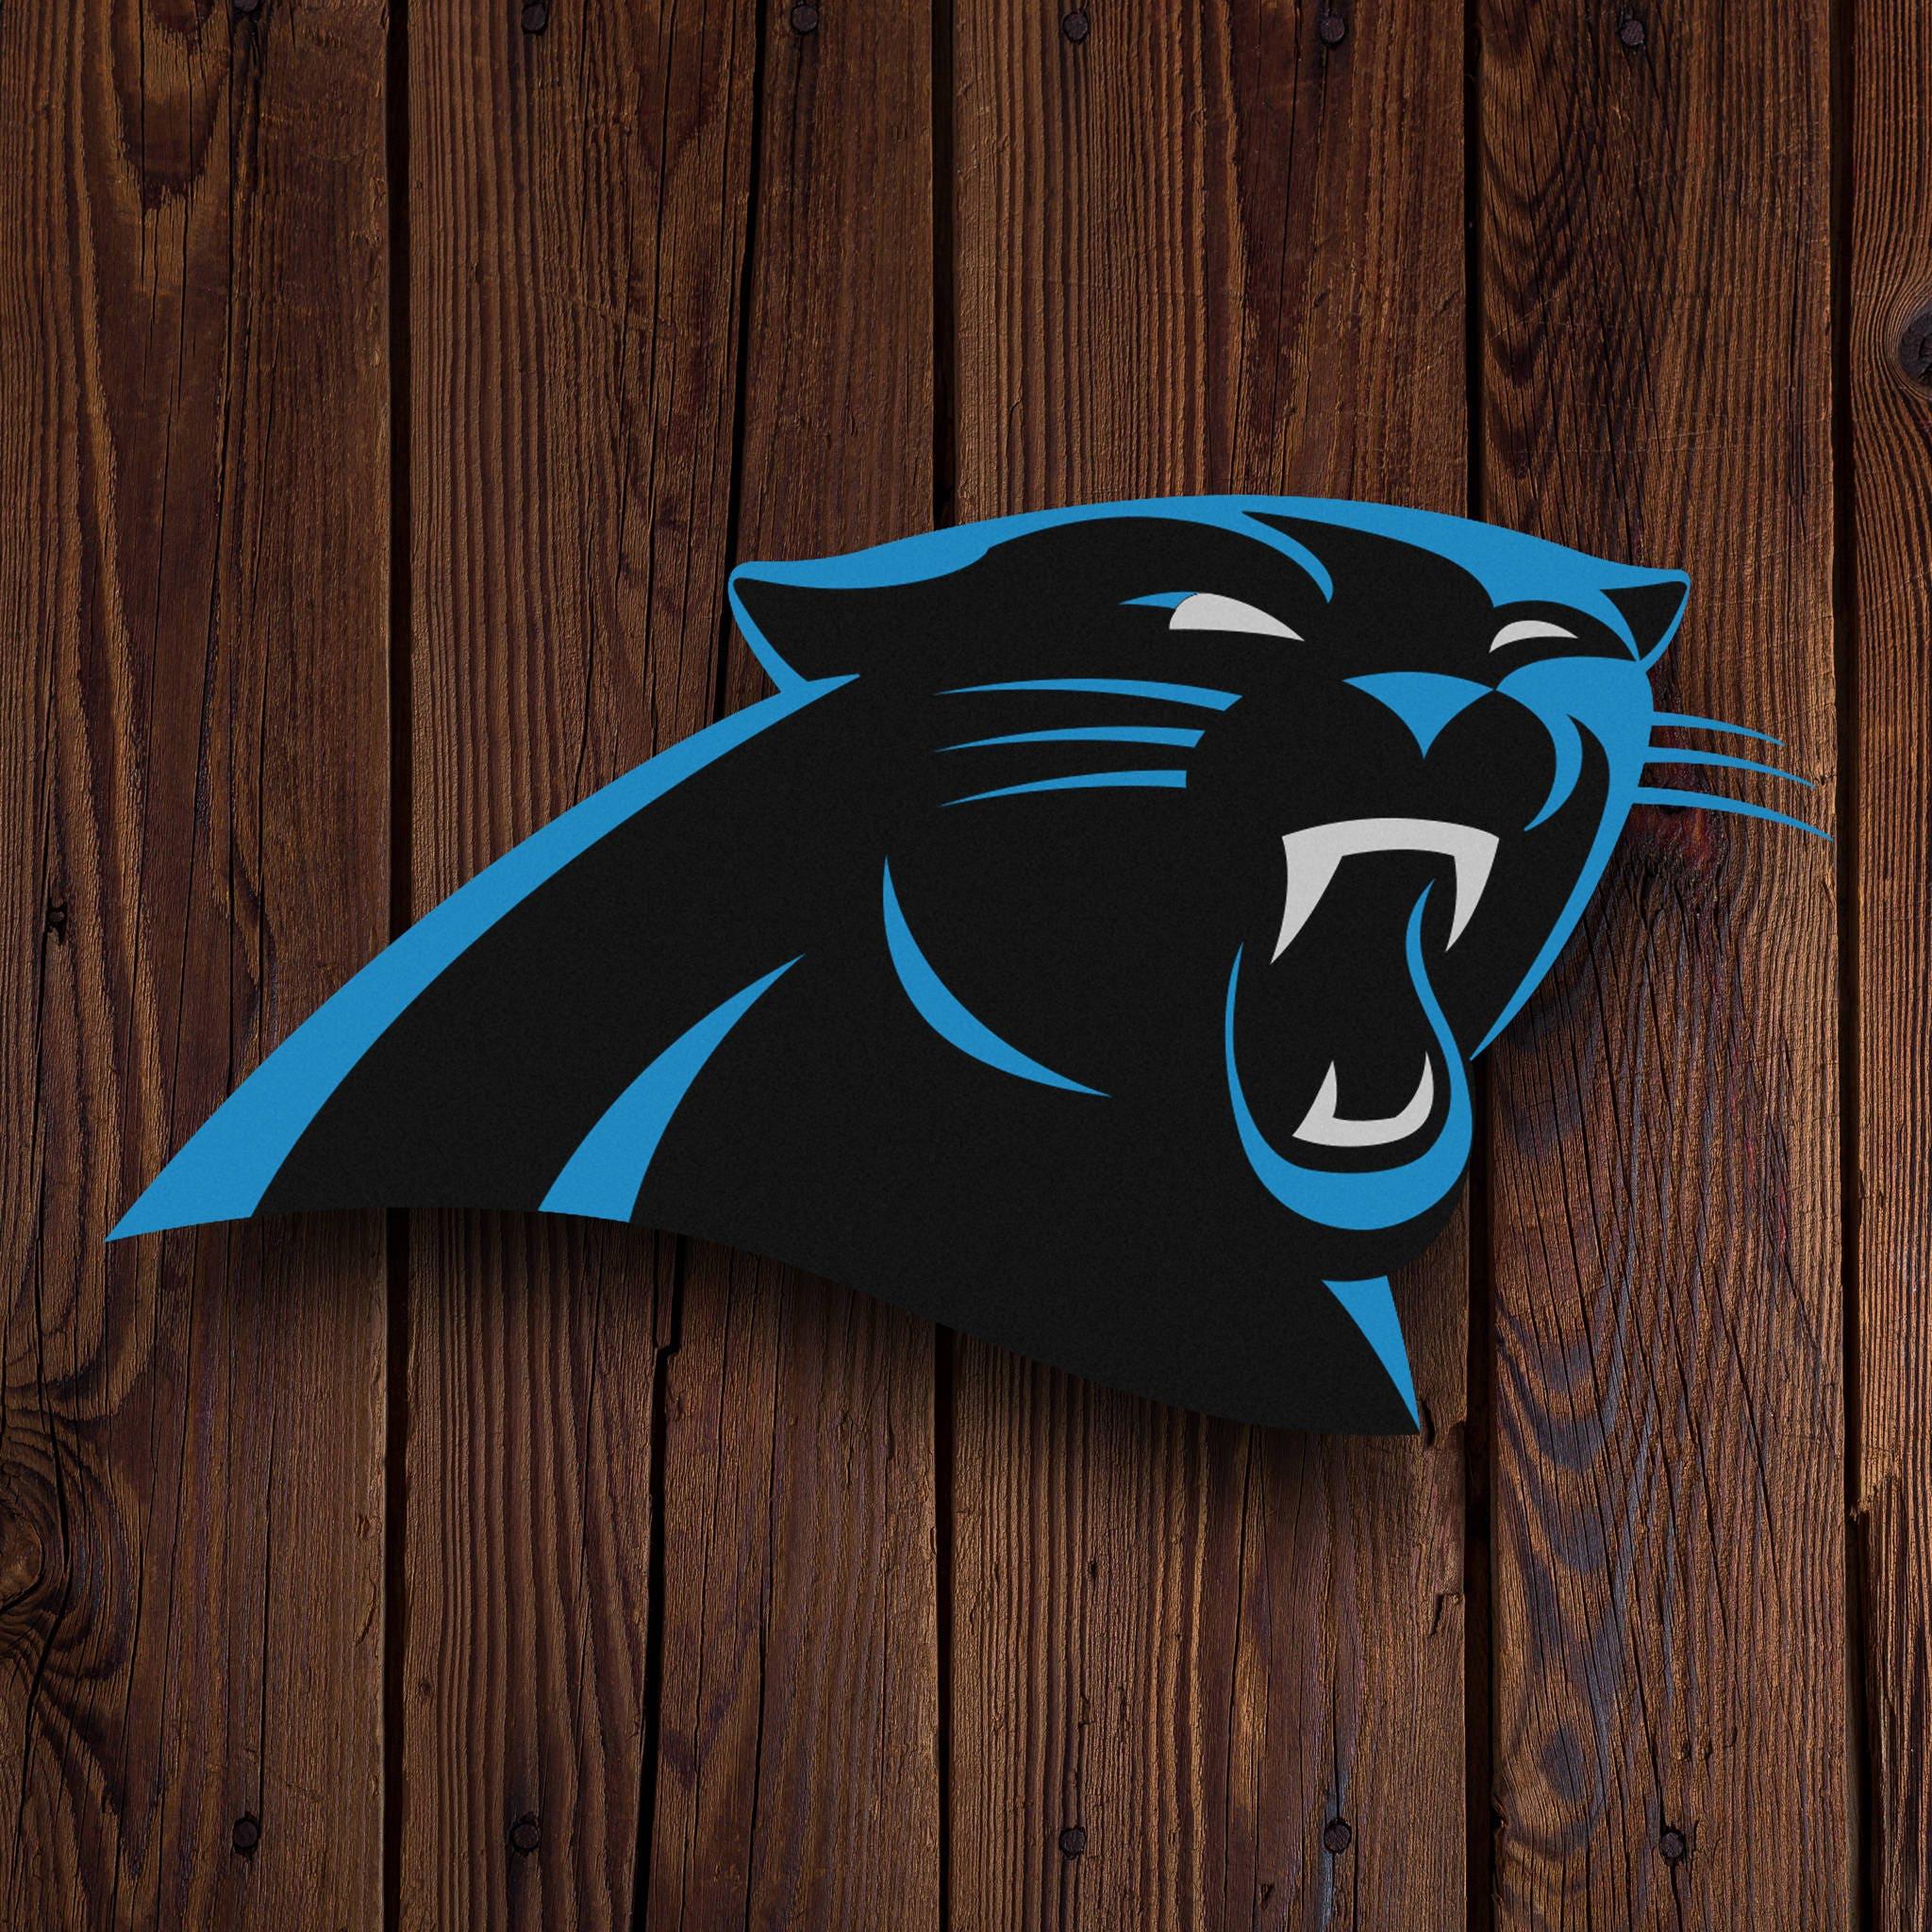 Carolina Panthers Decor|Wall Decor|Boy Room Decor|Boy Football Decor|Teen